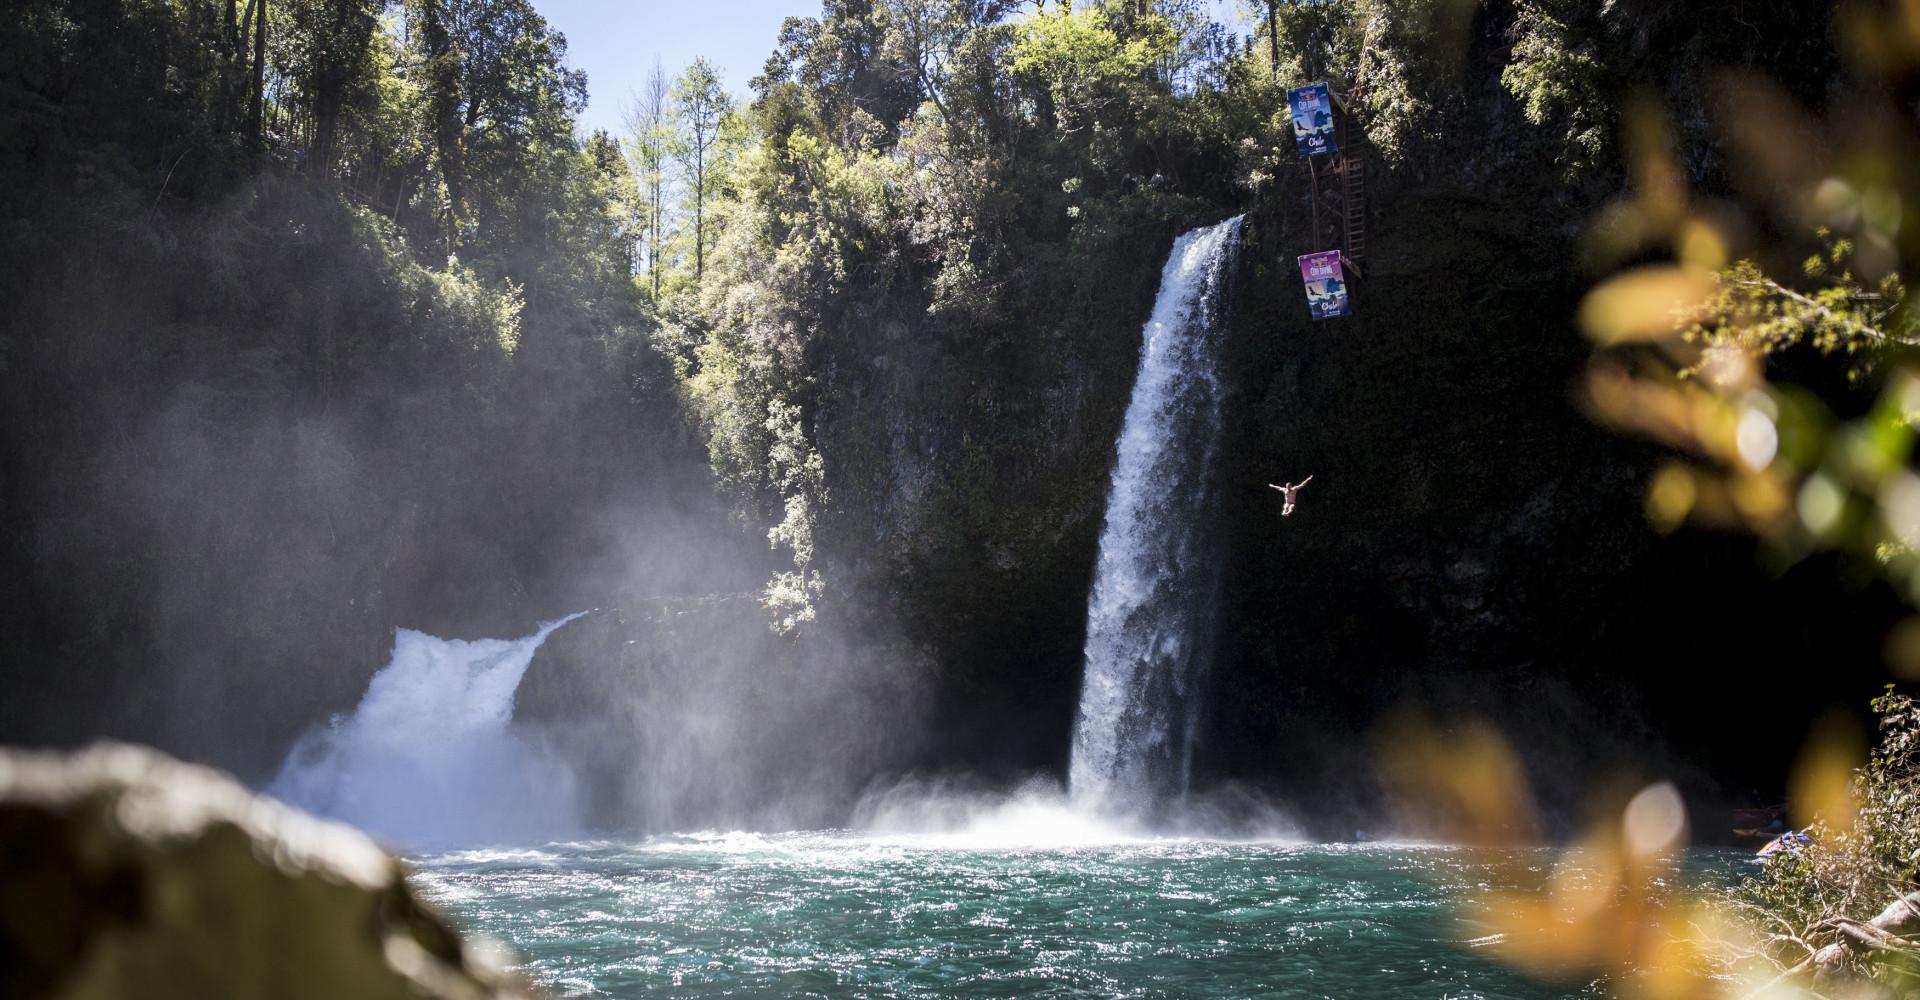 Waarom Chili reisbestemming nummer 1 is in 2018